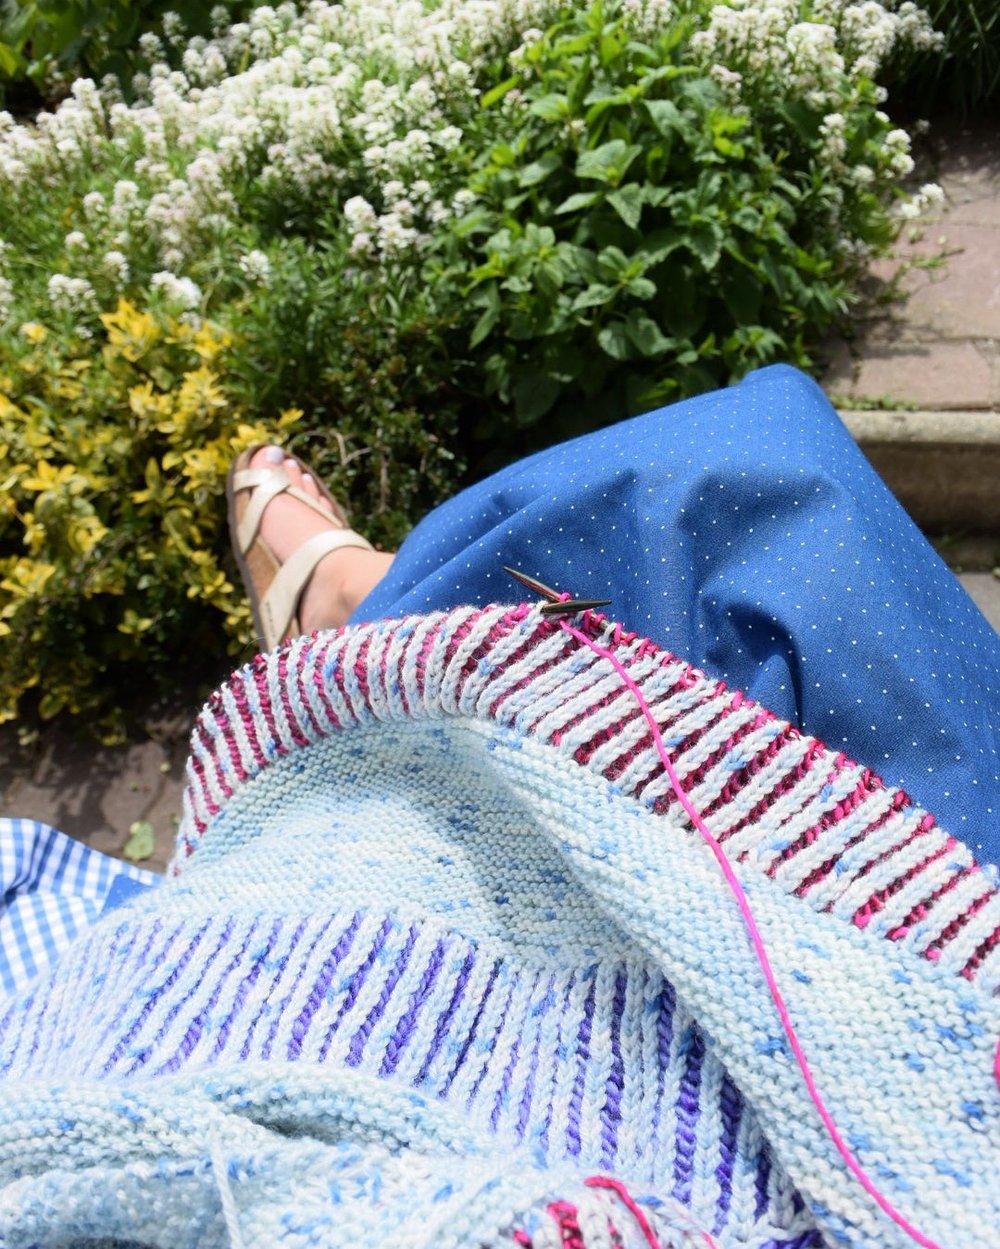 Working on my Briochealicious shawl in my Great Great Aunt Hermine's garden - one of my favorite memories of 2016!